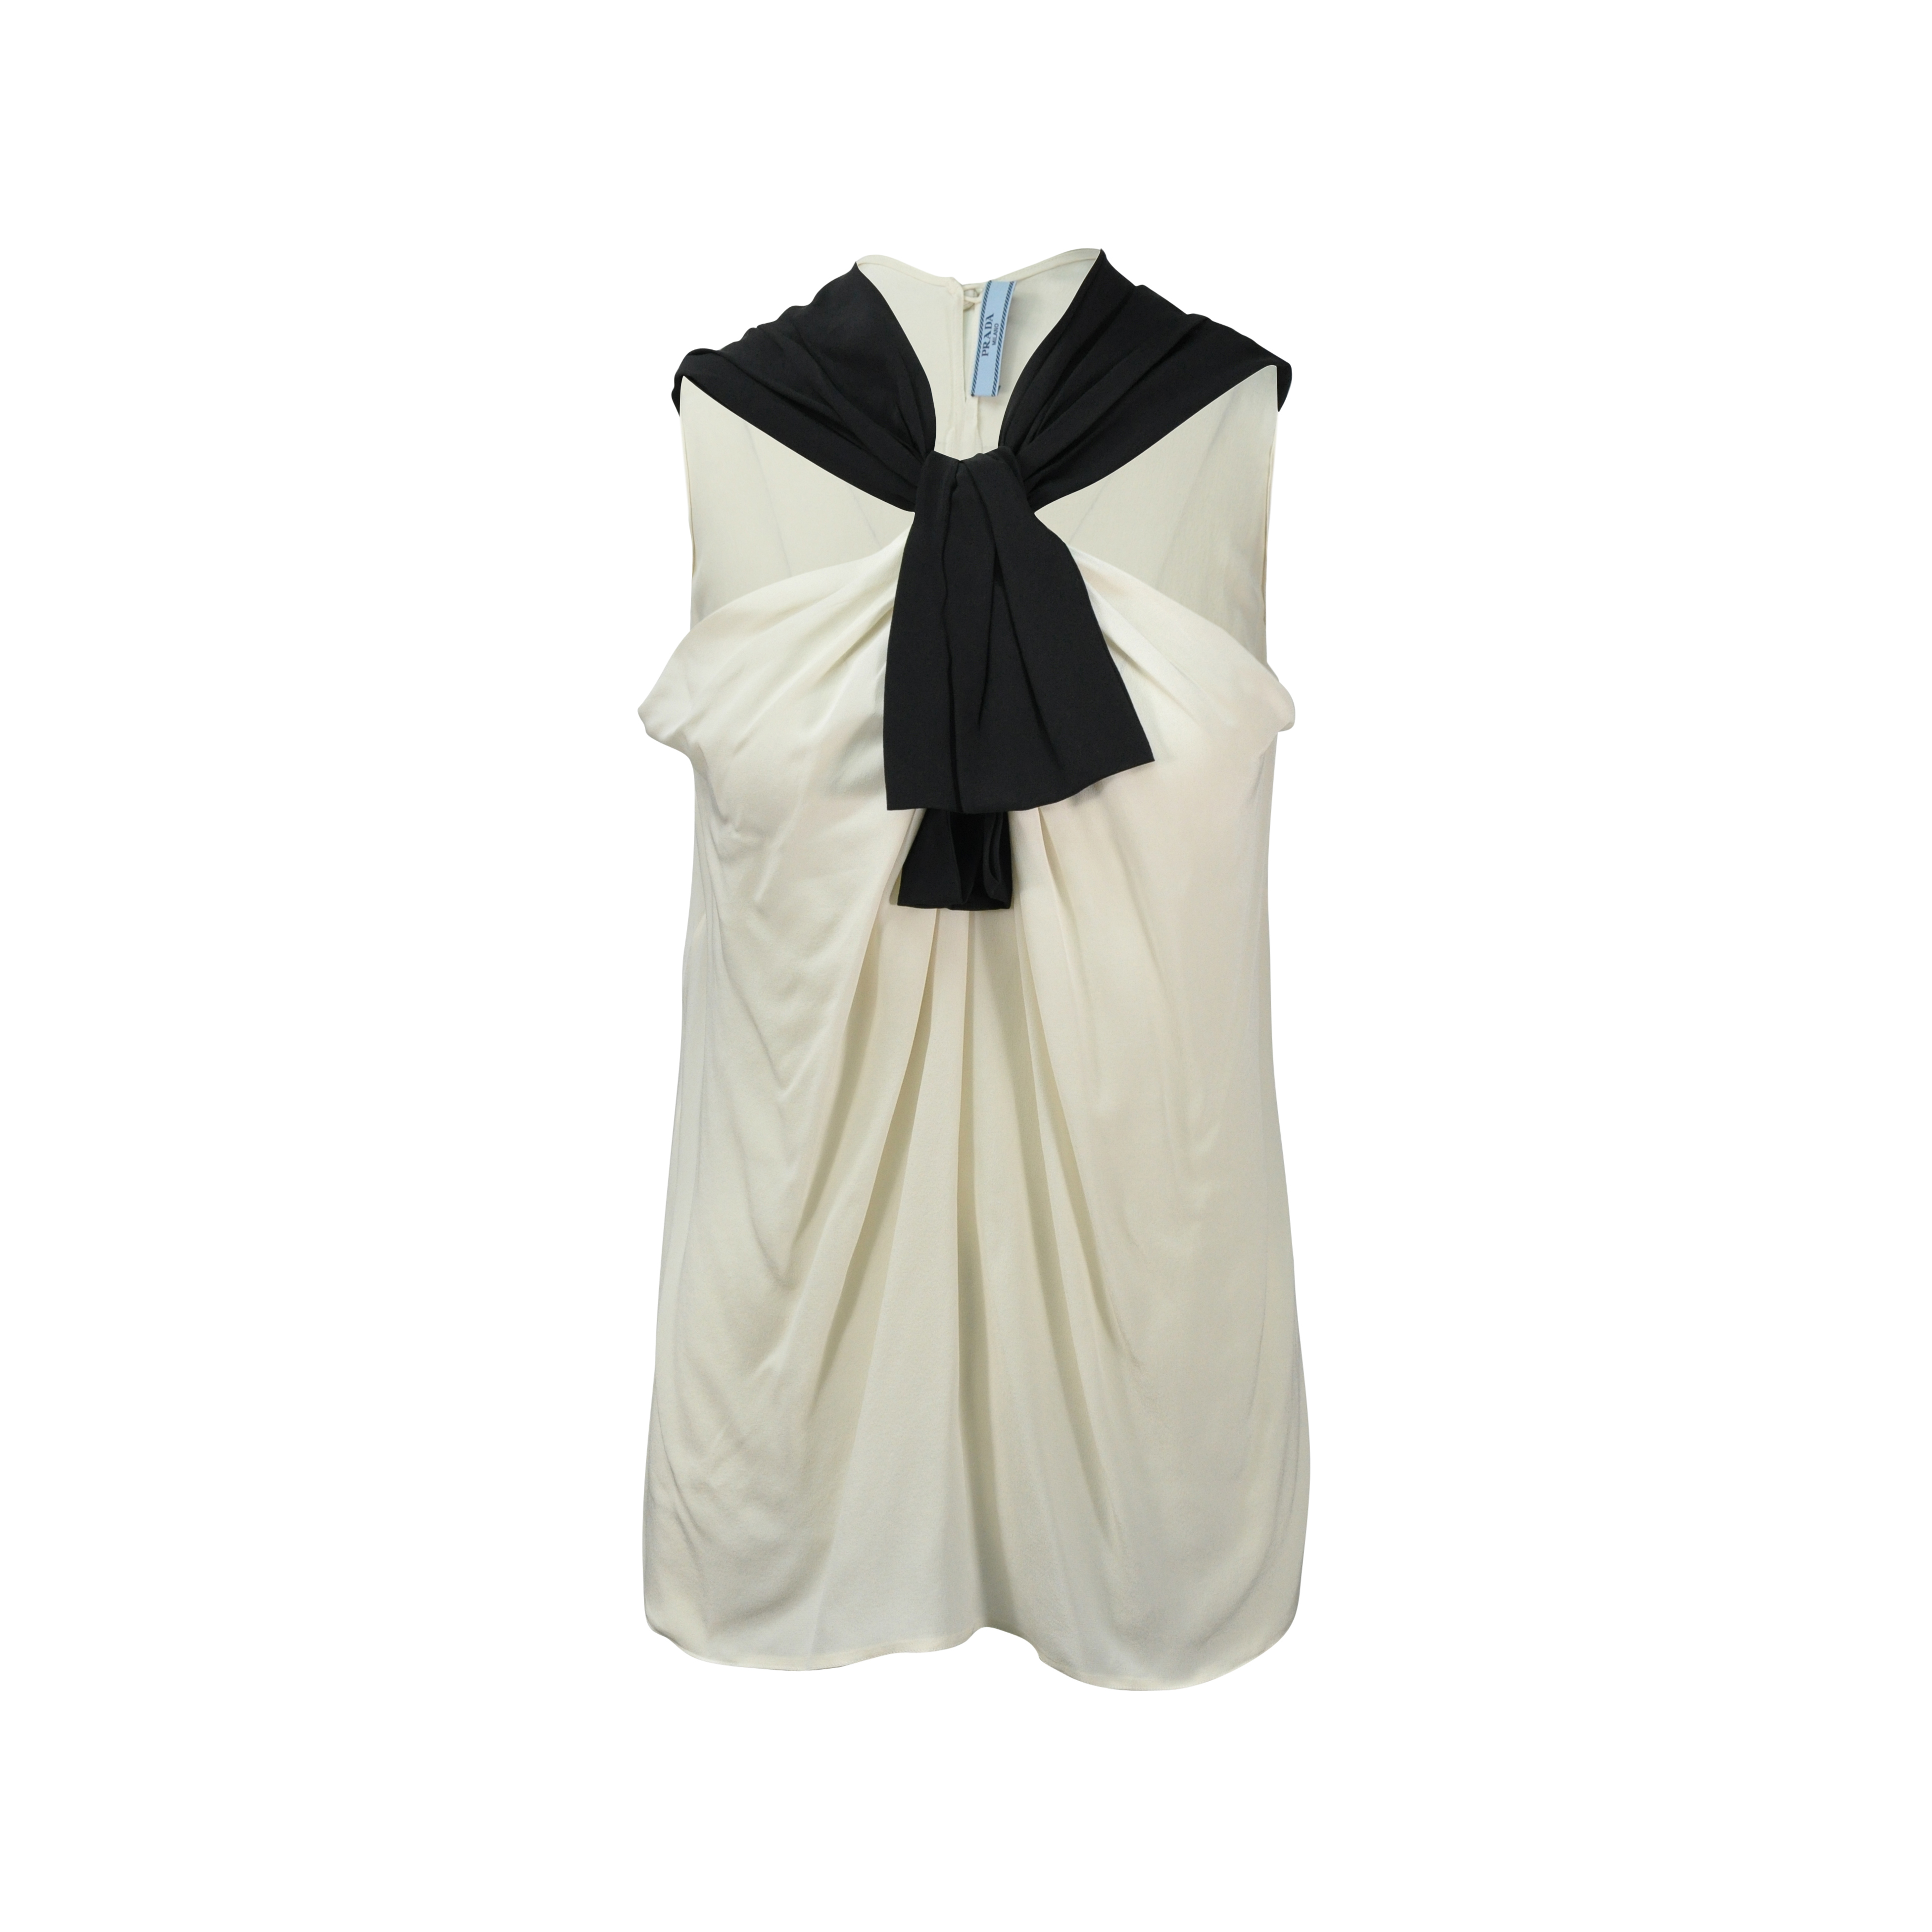 775a47c4c97e5 Authentic Second Hand Prada Tie Neck Silk Top (PSS-080-00114)